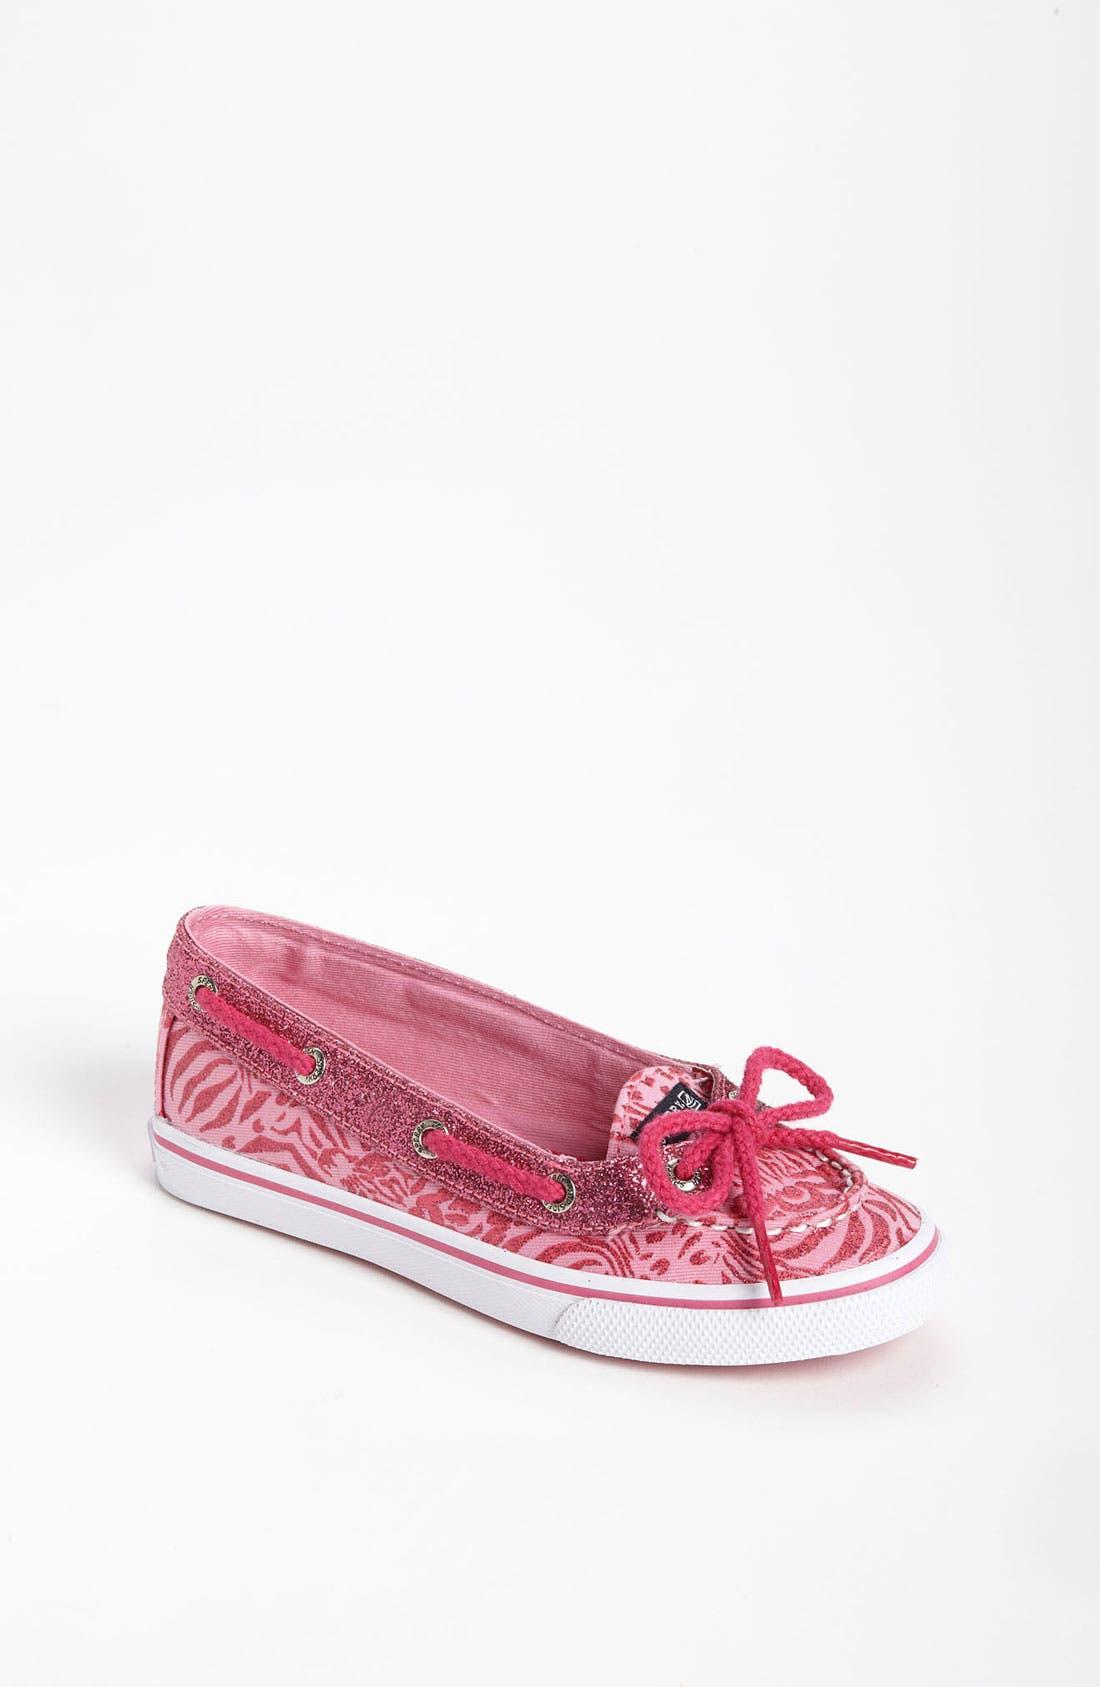 Main Image - Sperry Top-Sider® Kids 'Carline' Slip-On (Toddler, Little Kid & Big Kid)